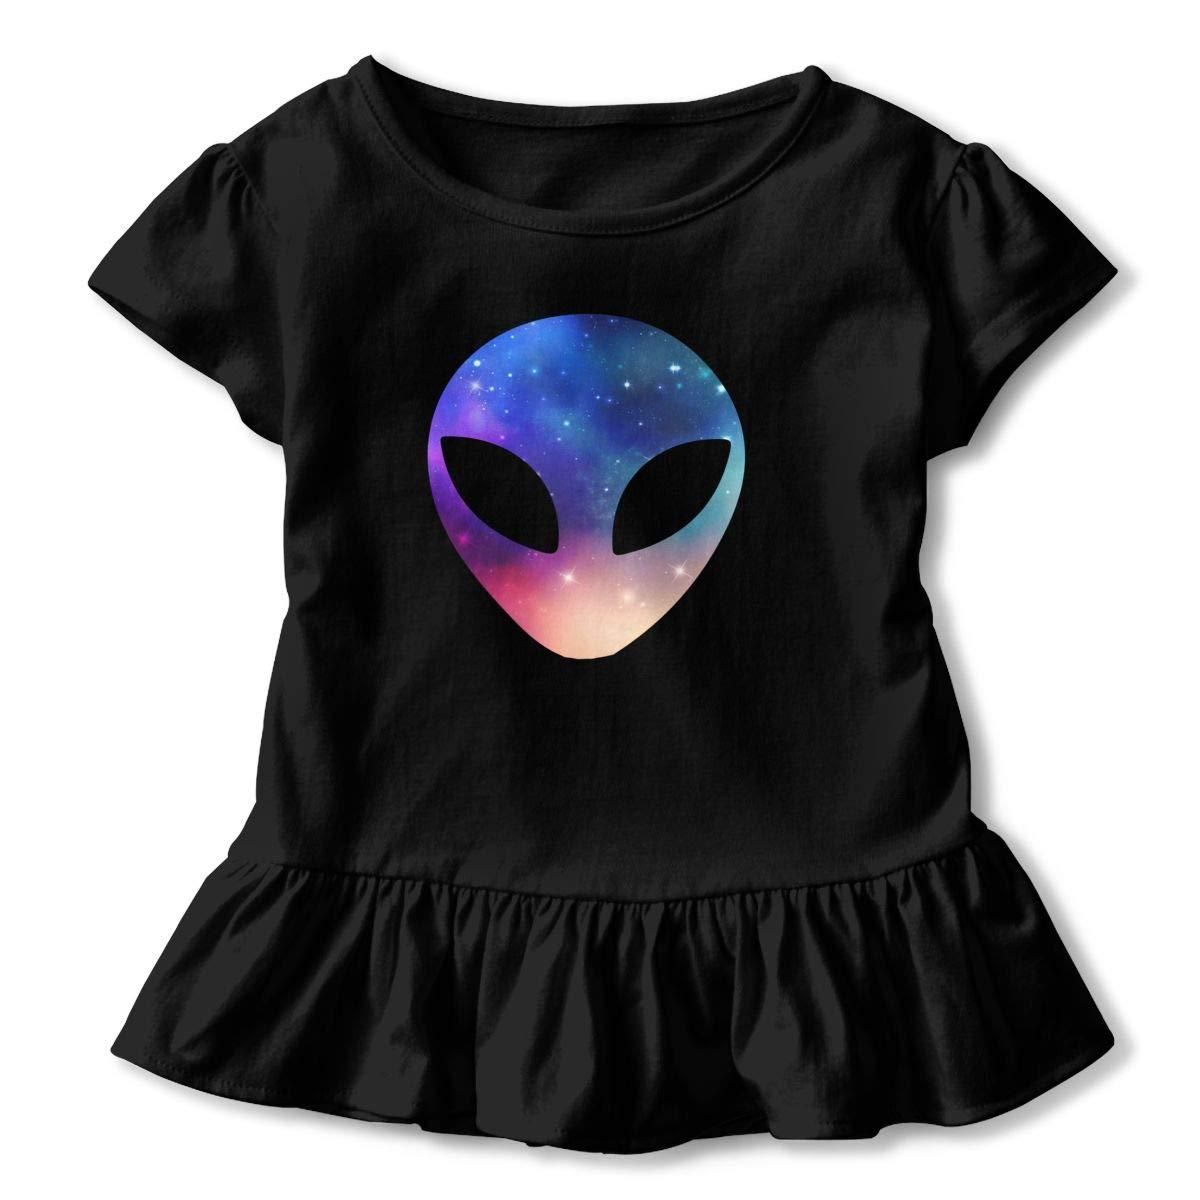 CZnuen Space Alien Head Colorful 2-6T Baby Girls Cotton Jersey Short Sleeve Ruffle Tee